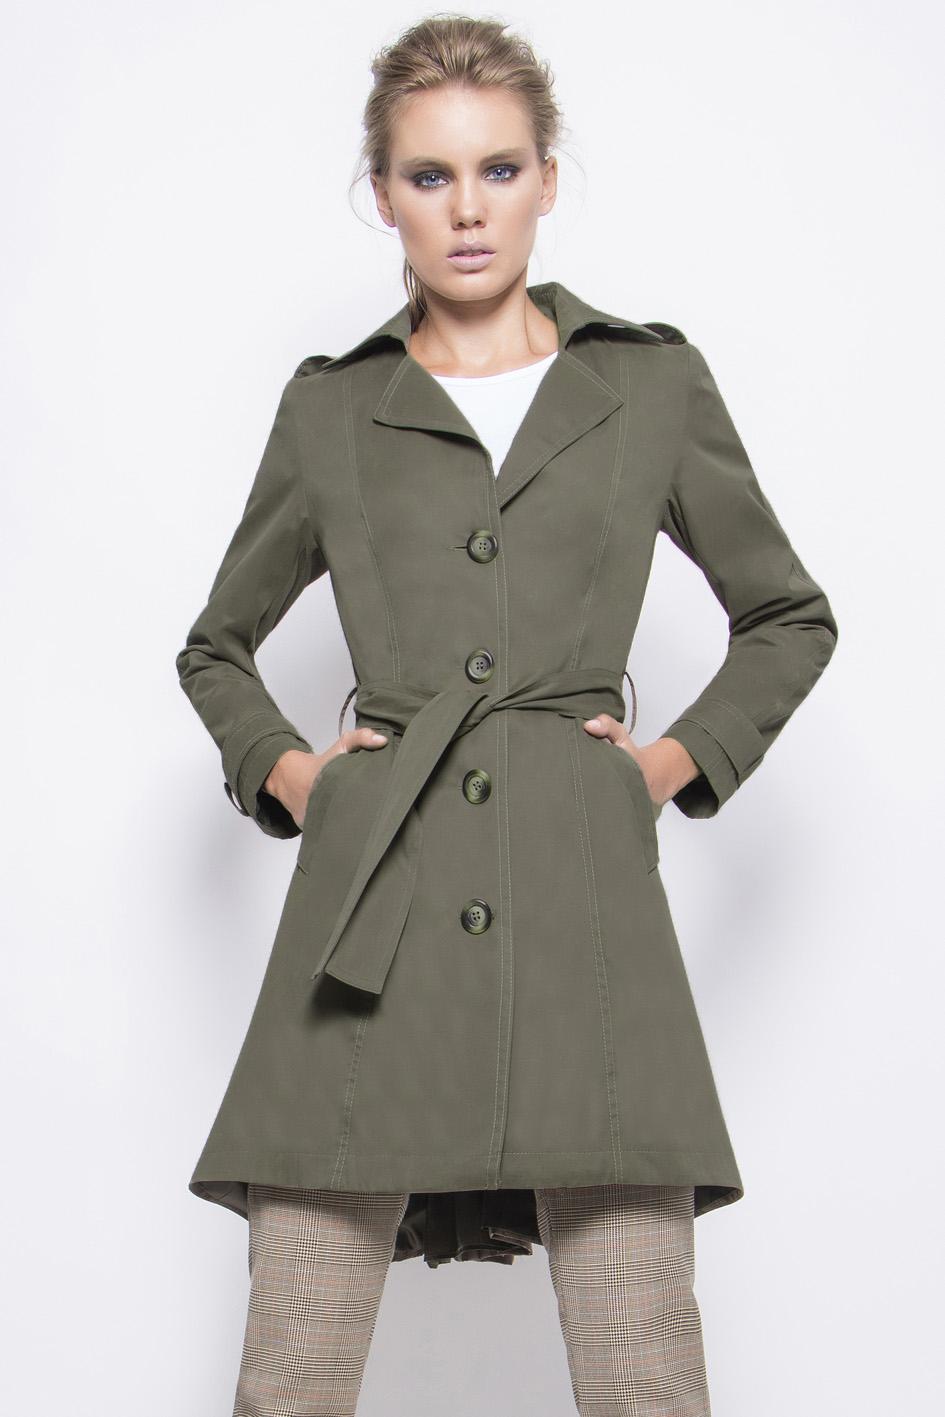 4a5ffcf05512 Καπαρντίνα Trench - Maxin Fashion